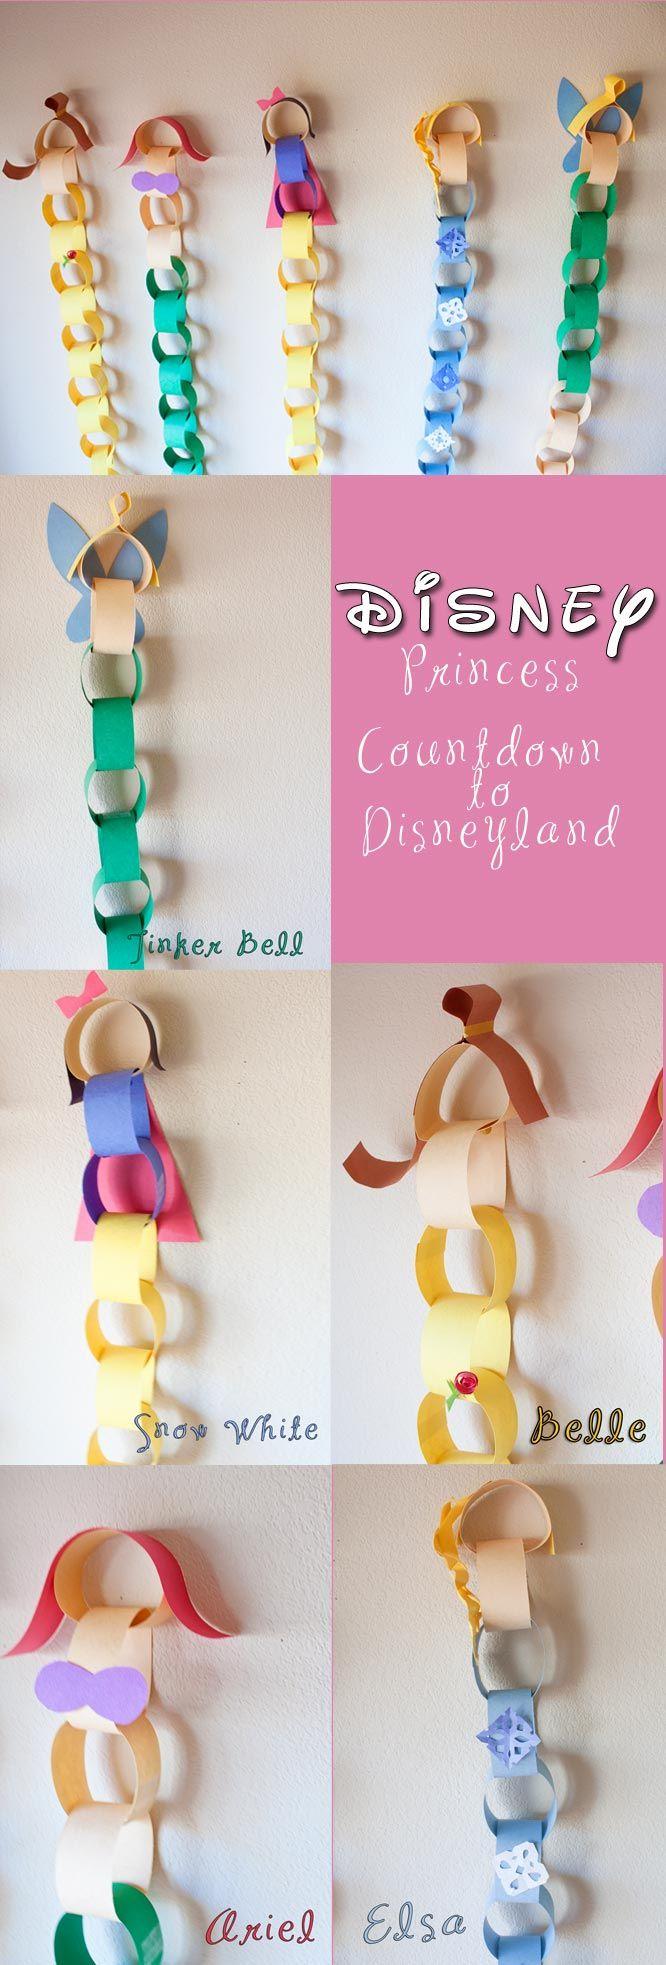 Disneyland Countdown with the Disney Princesses